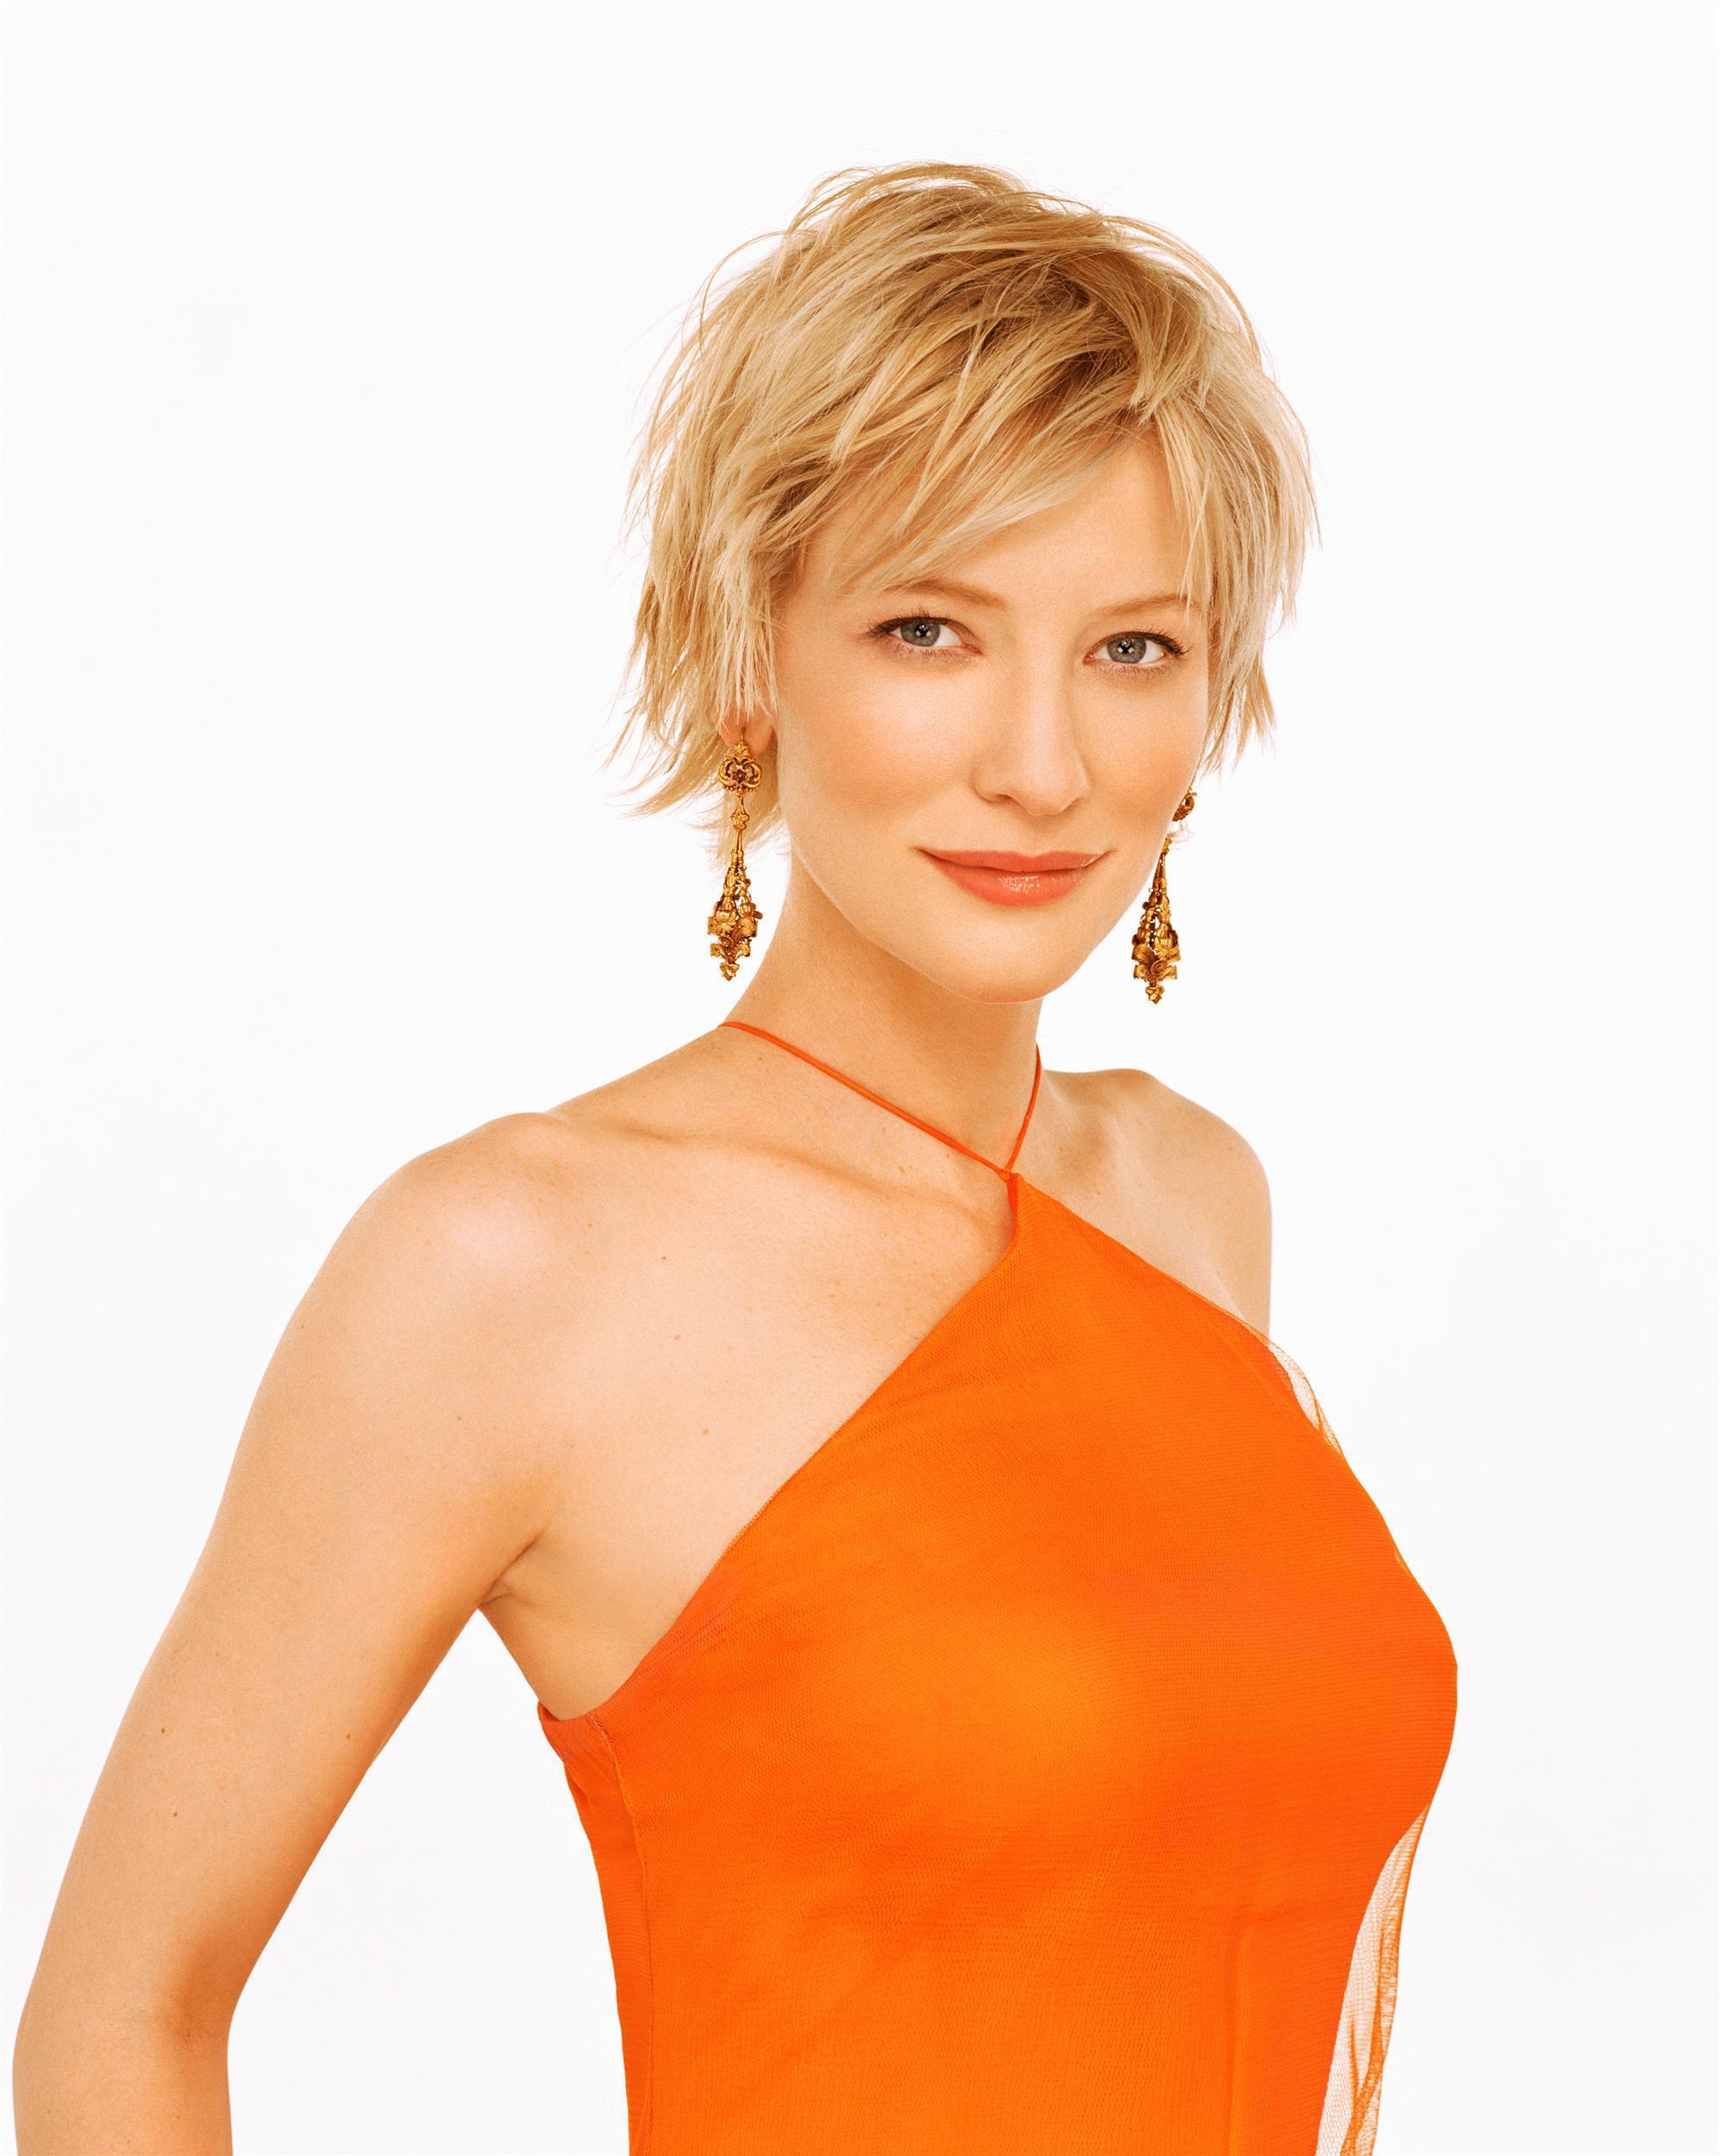 Cate Blanchett Desnuda Página 9 Fotos Desnuda Descuido Topless